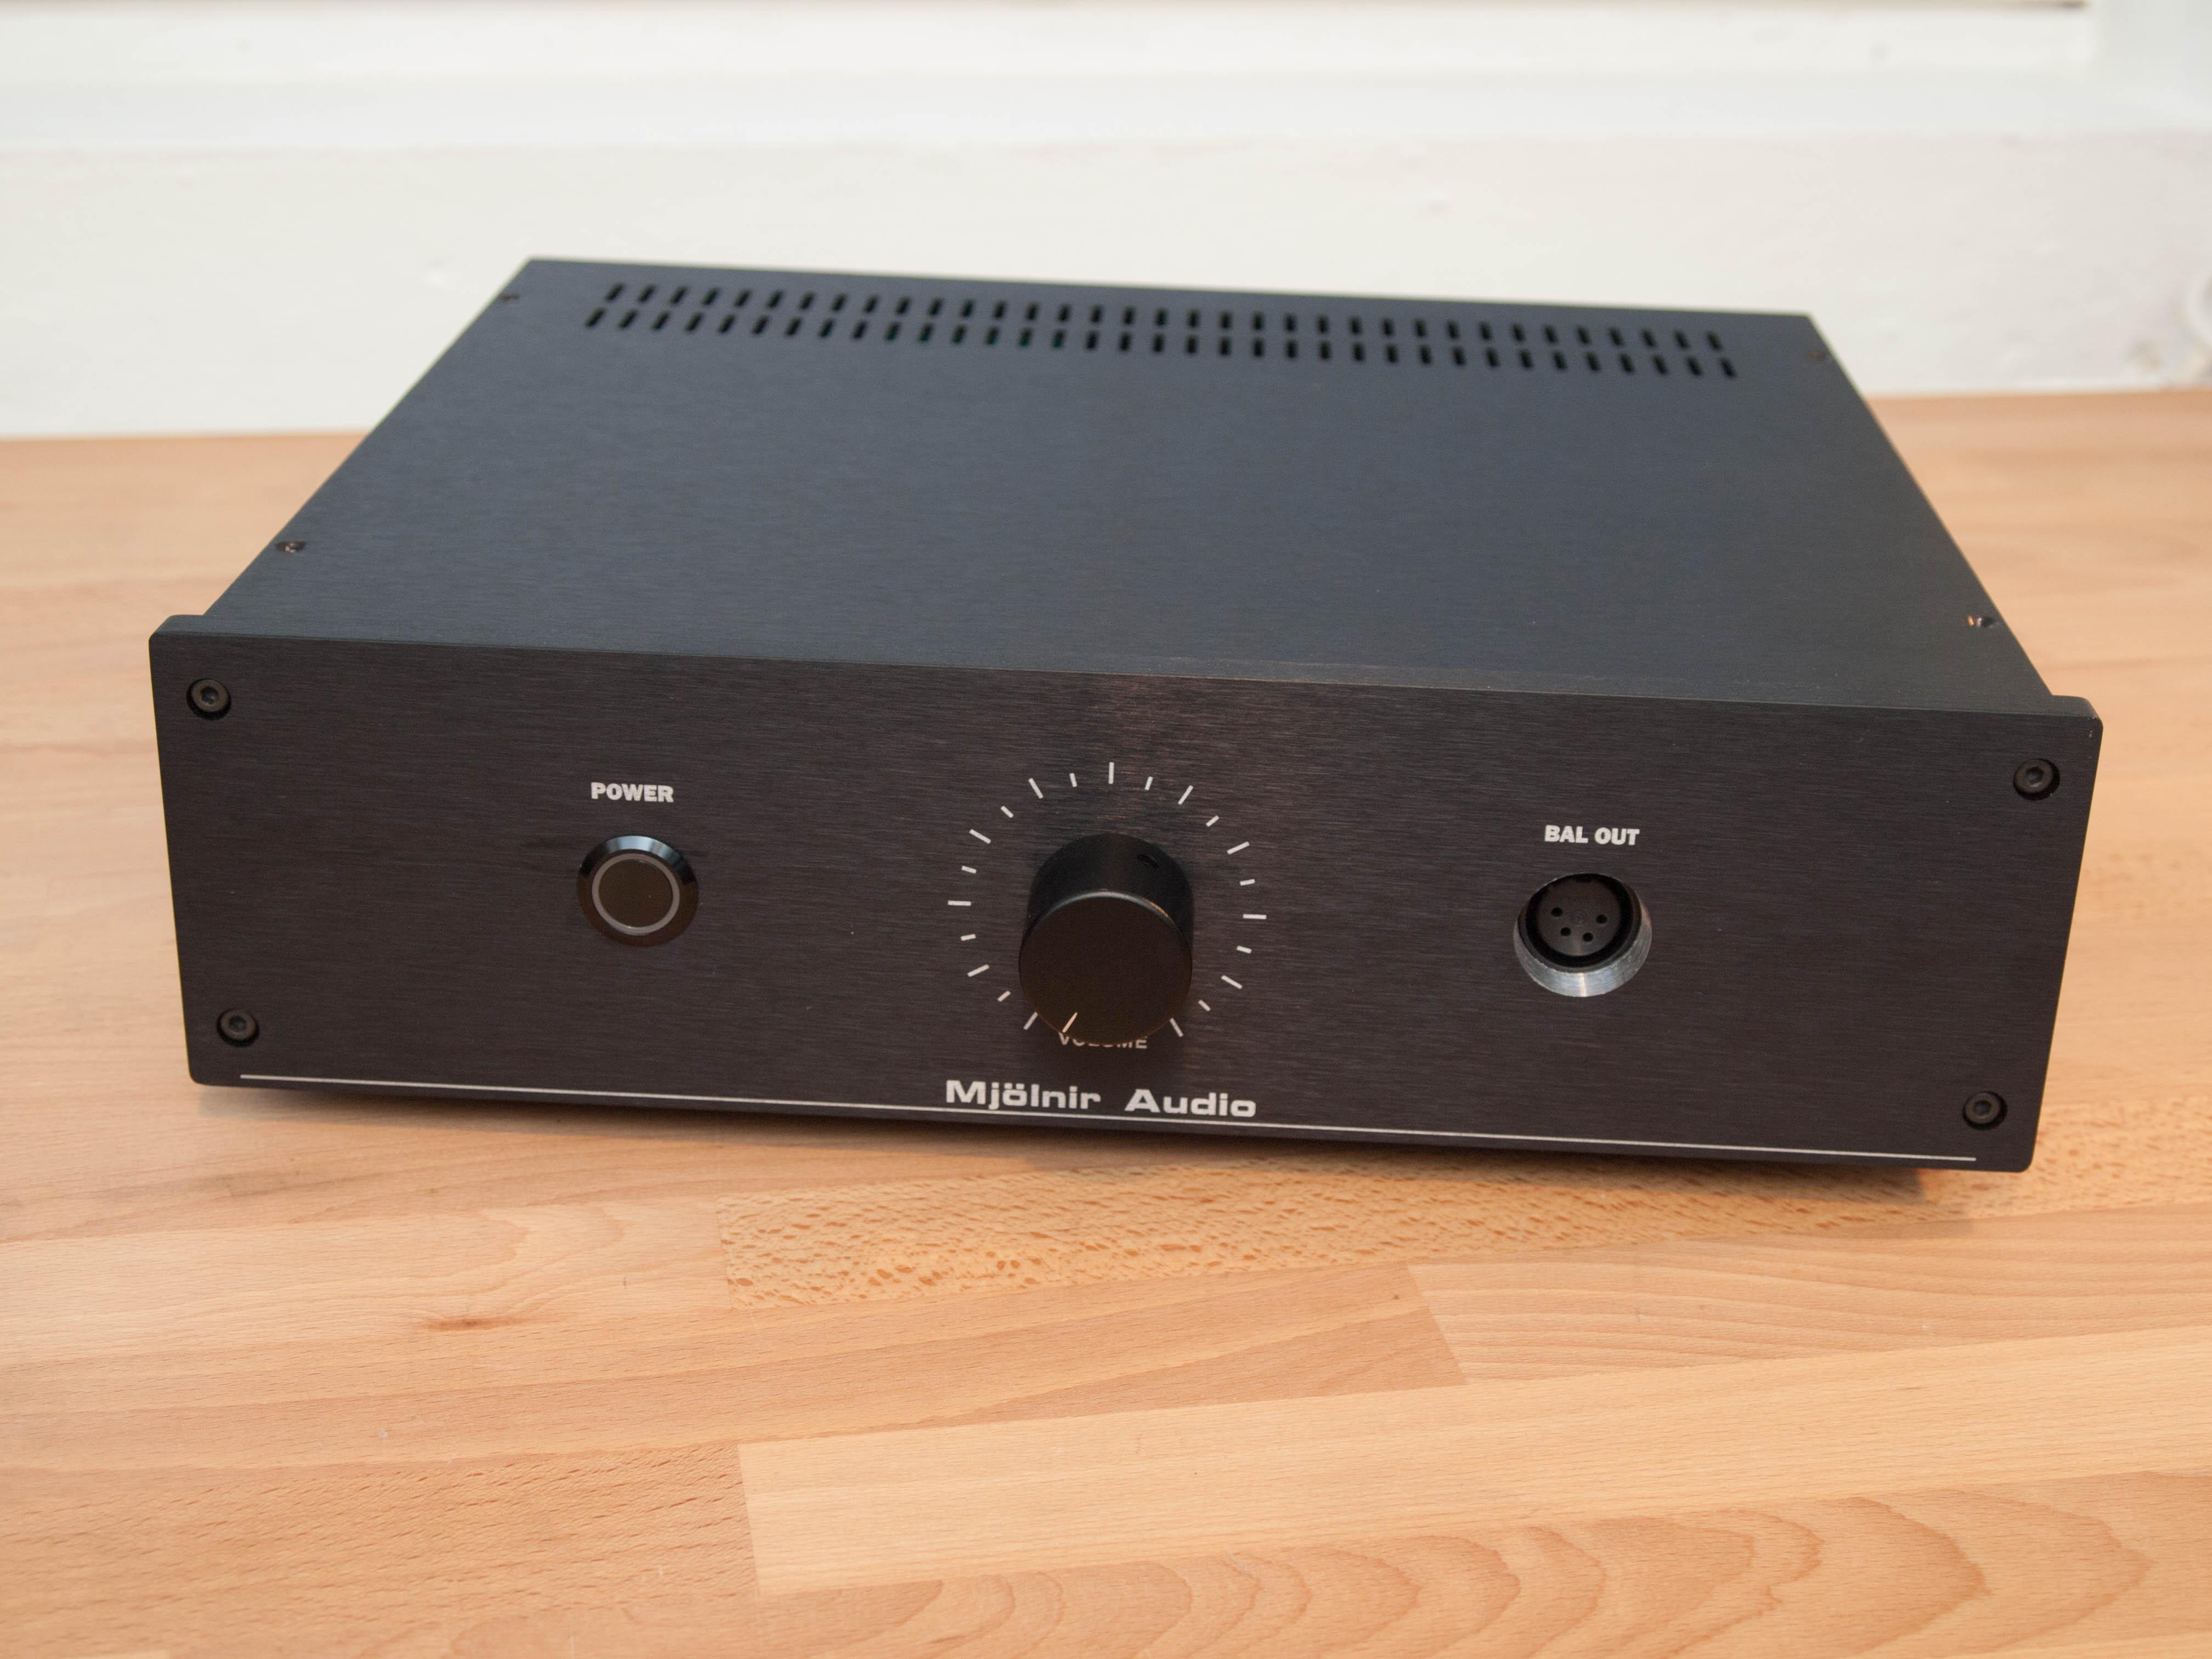 Amplifiers for dynamic headphones – Mjölnir-Audio